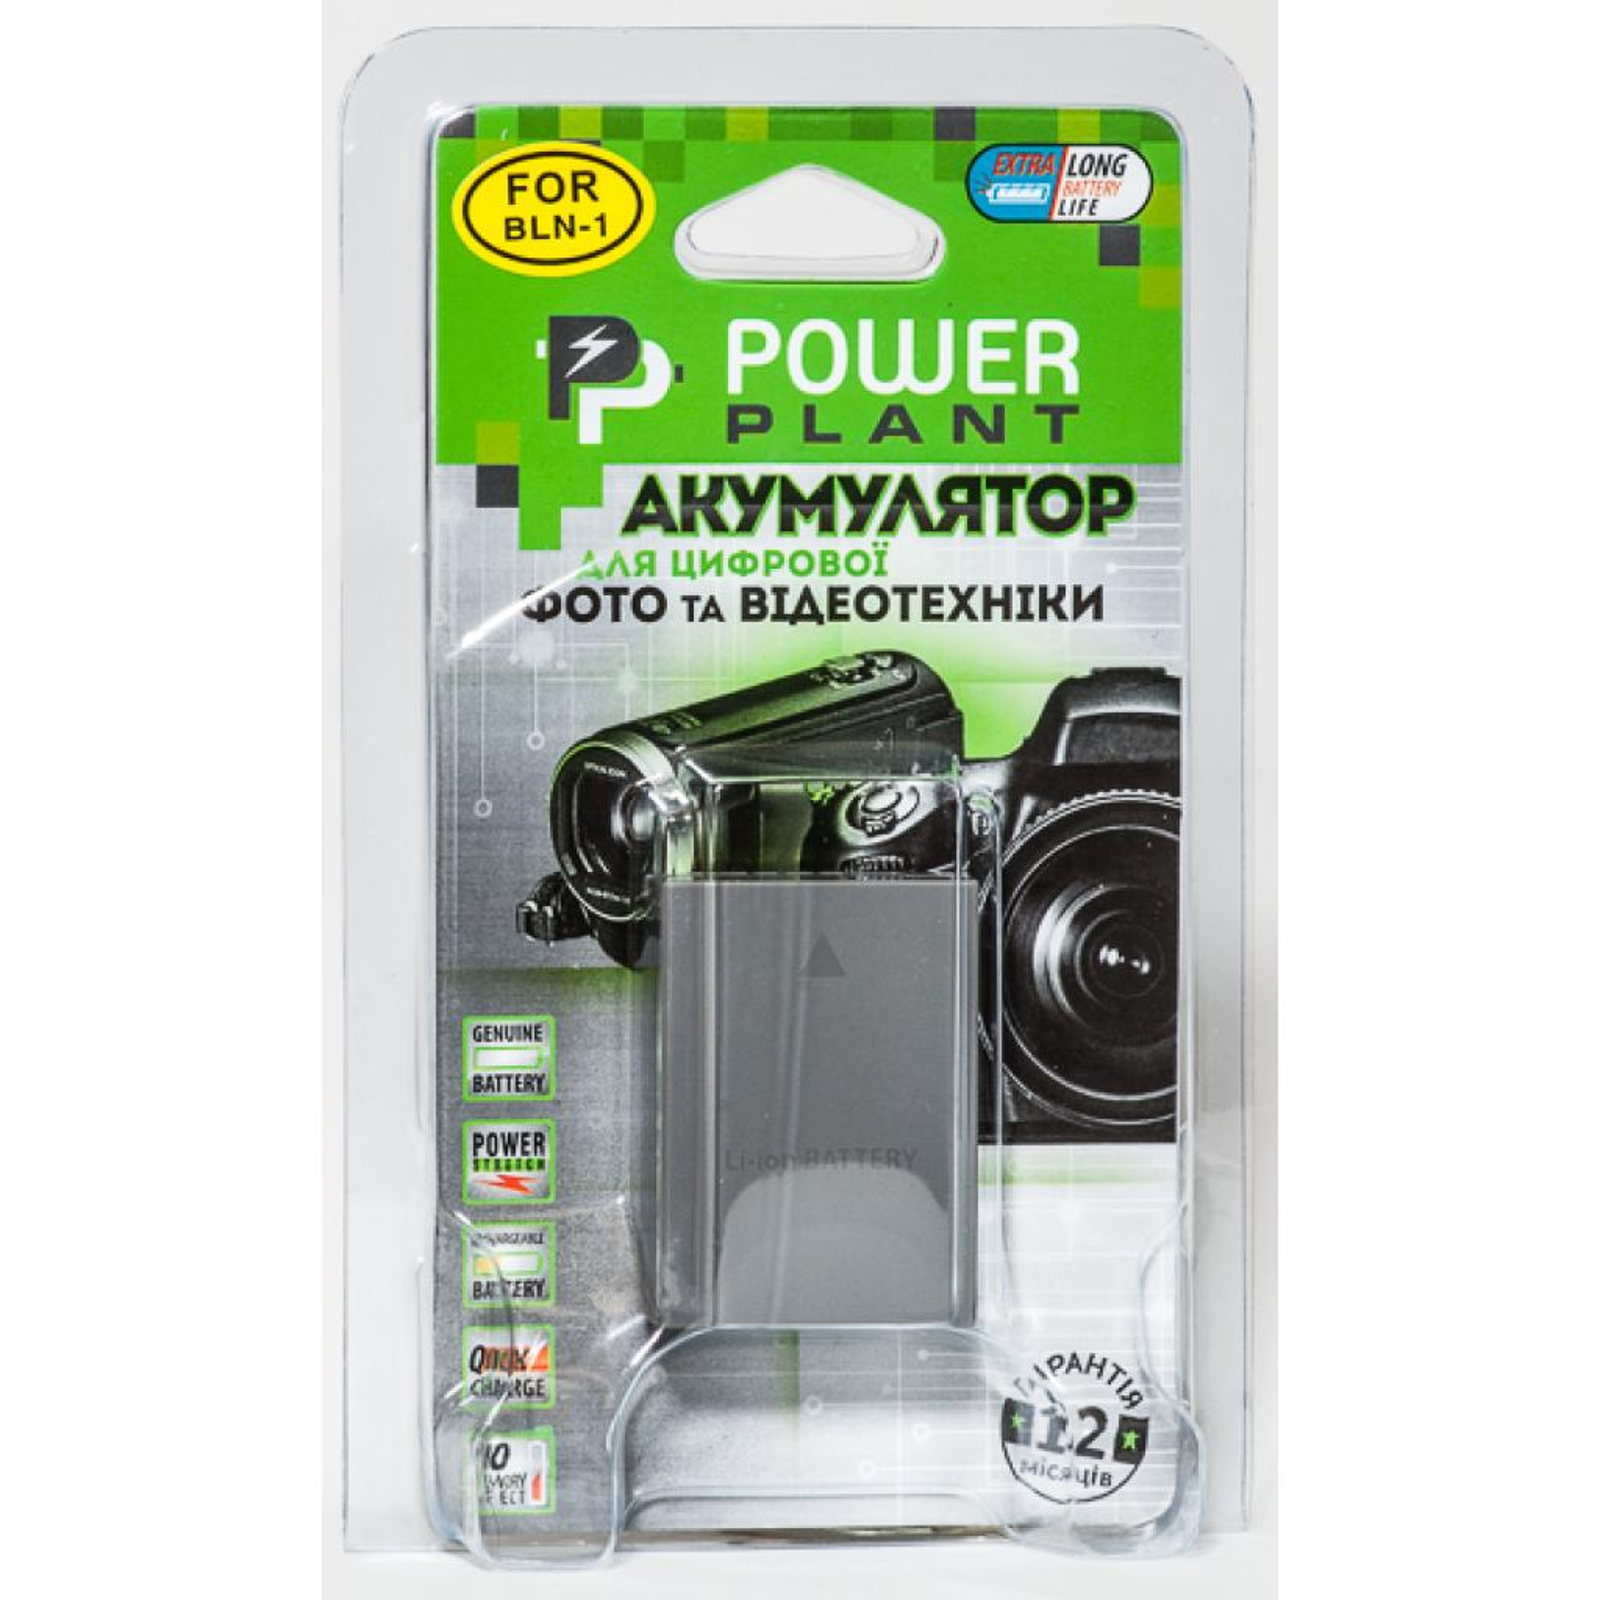 Аккумулятор к фото/видео PowerPlant Olympus PS-BLN1 (DV00DV1332) изображение 3